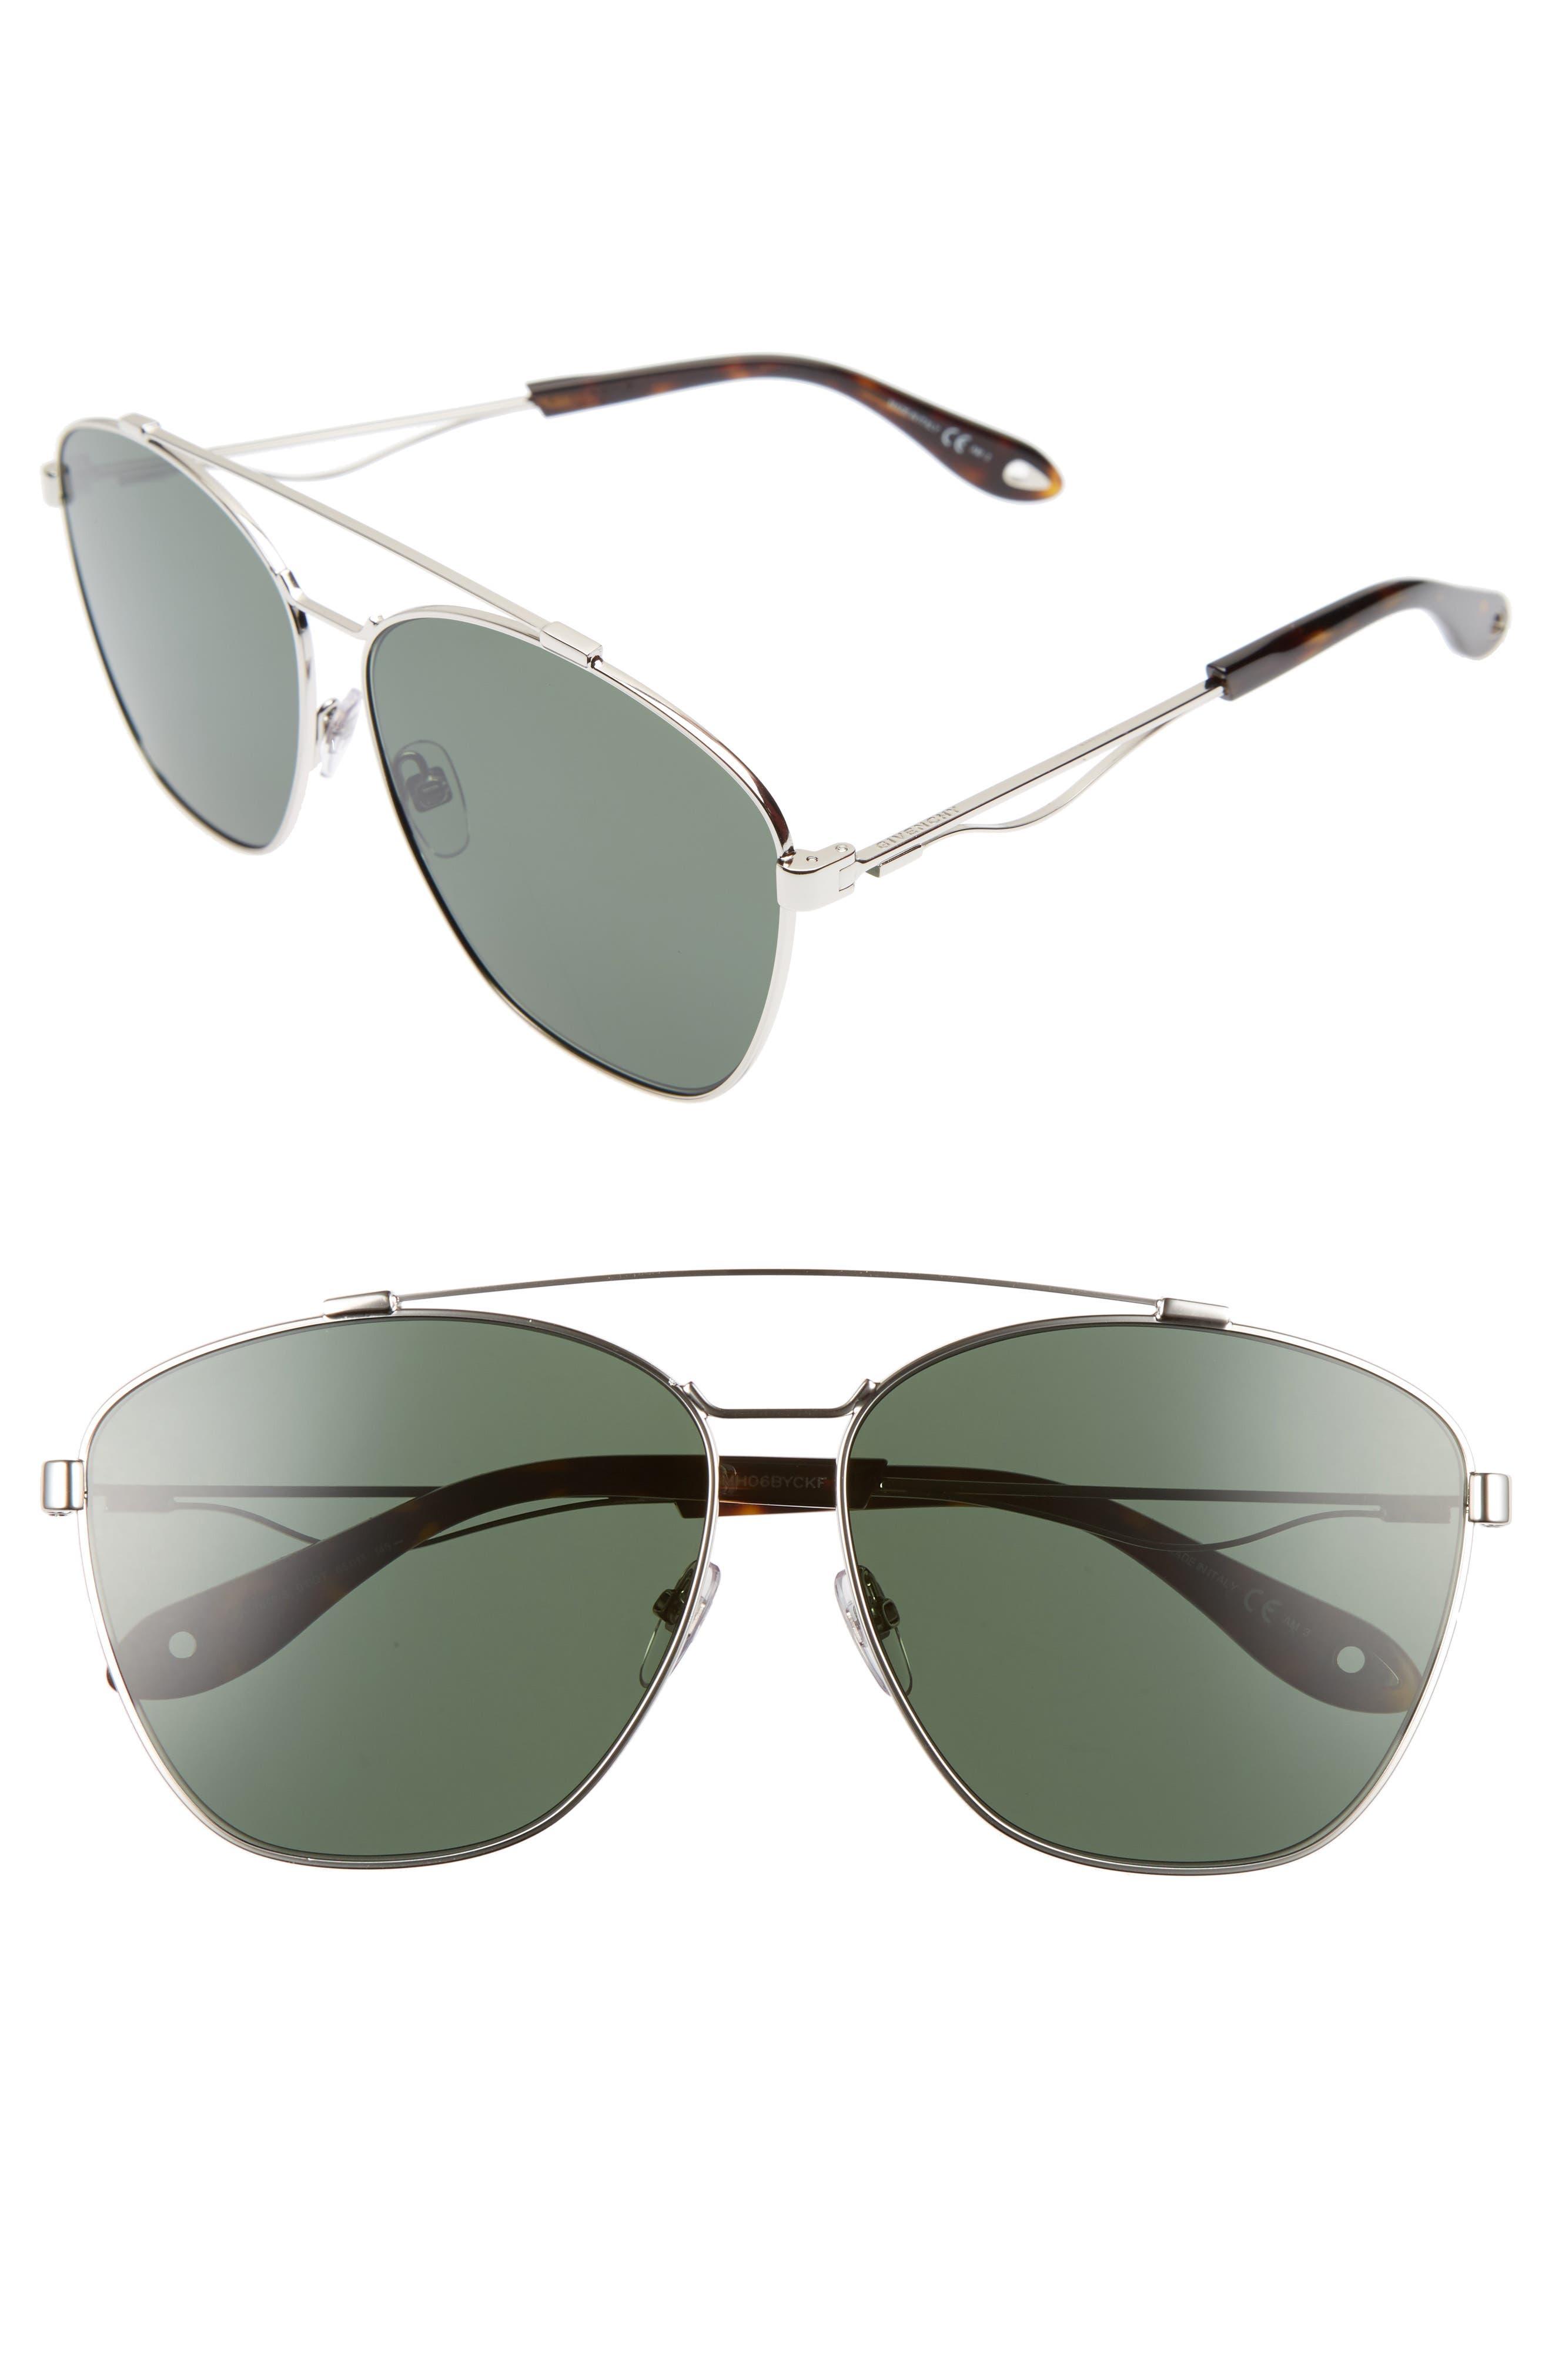 65mm Round Aviator Sunglasses,                         Main,                         color, 043